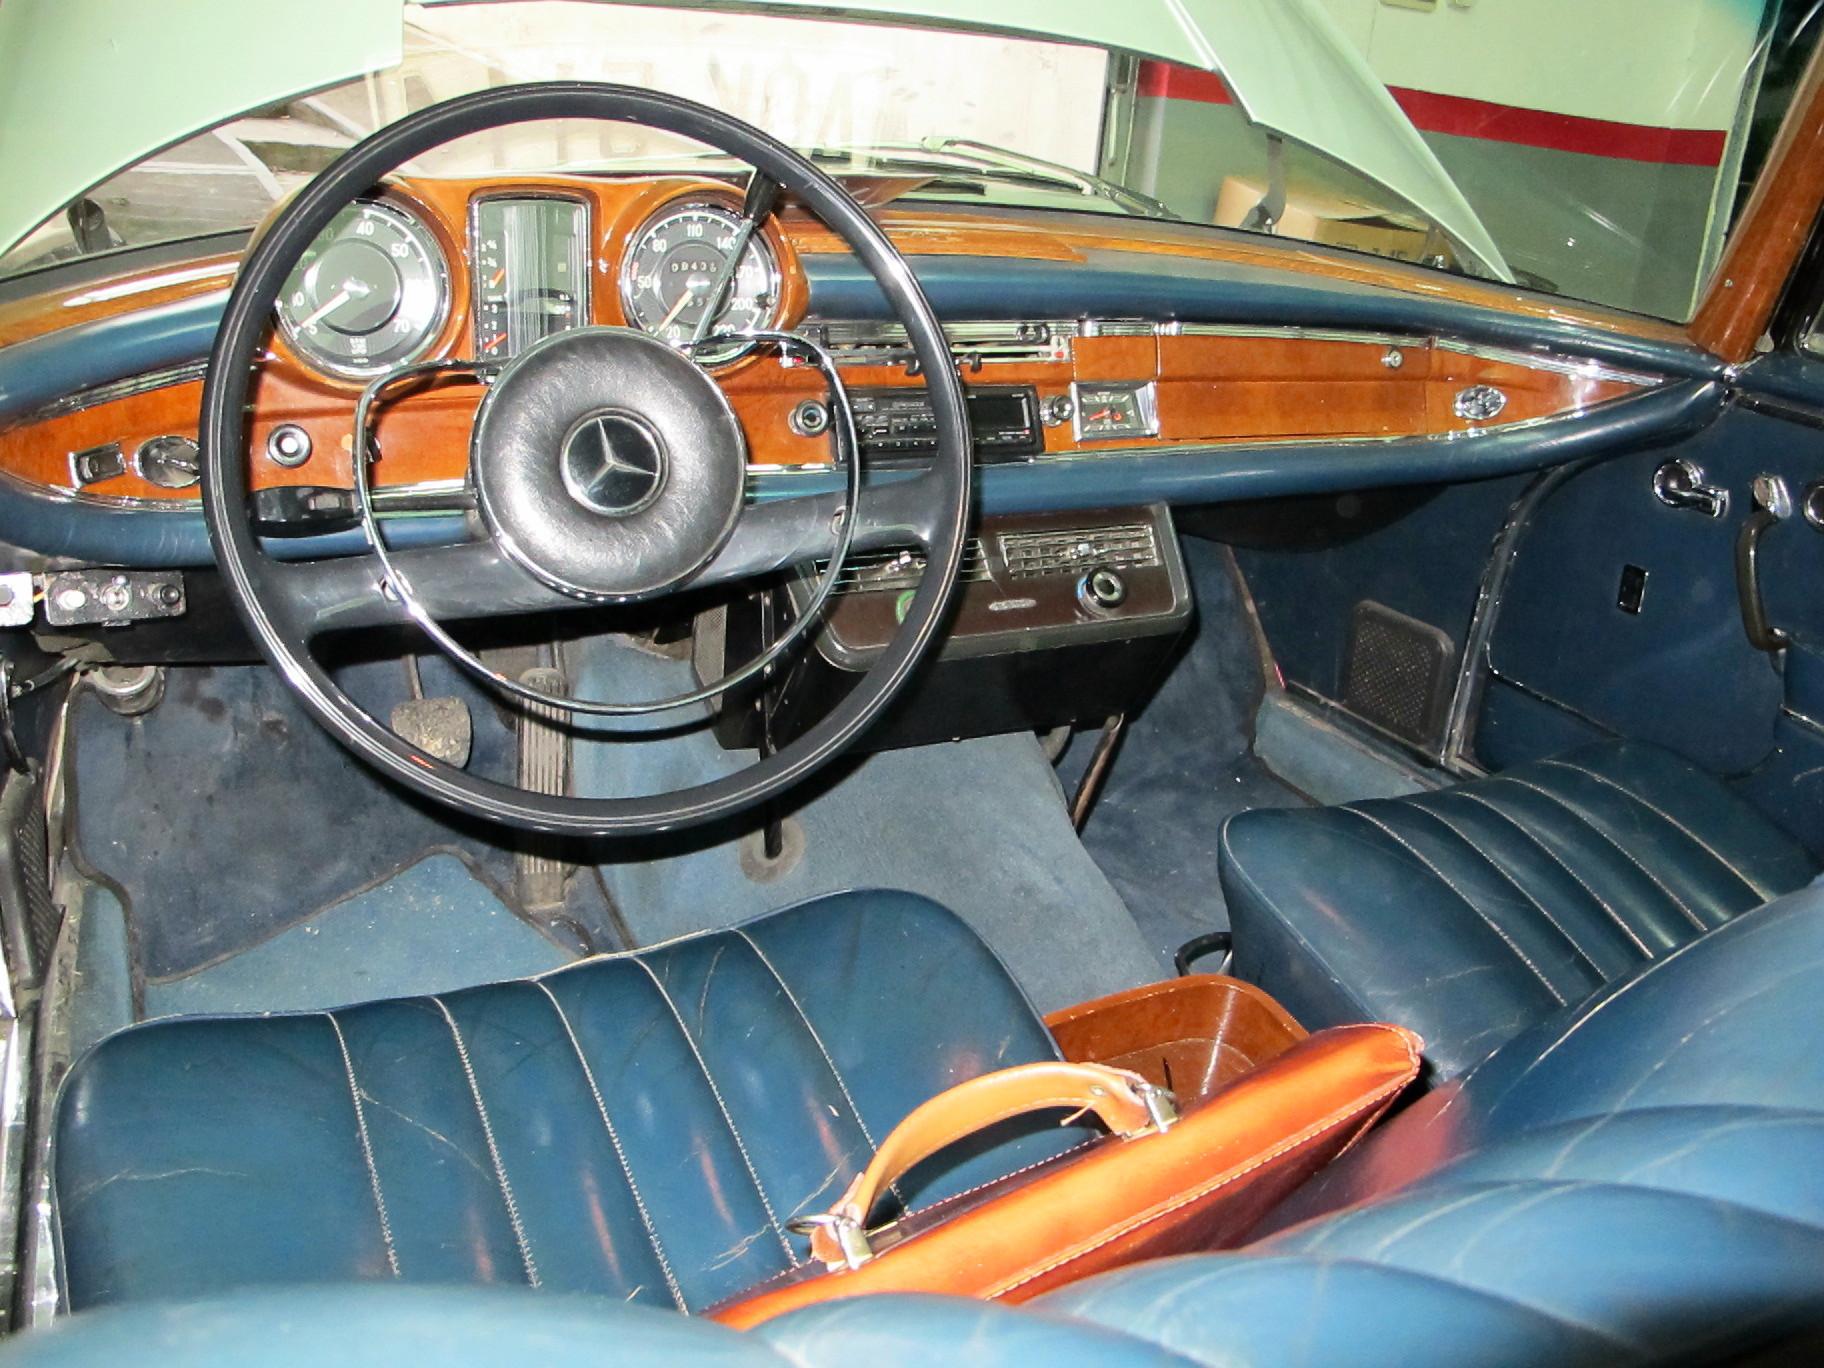 The Day I Met Princess Michaela A K A 1967 Mercedes